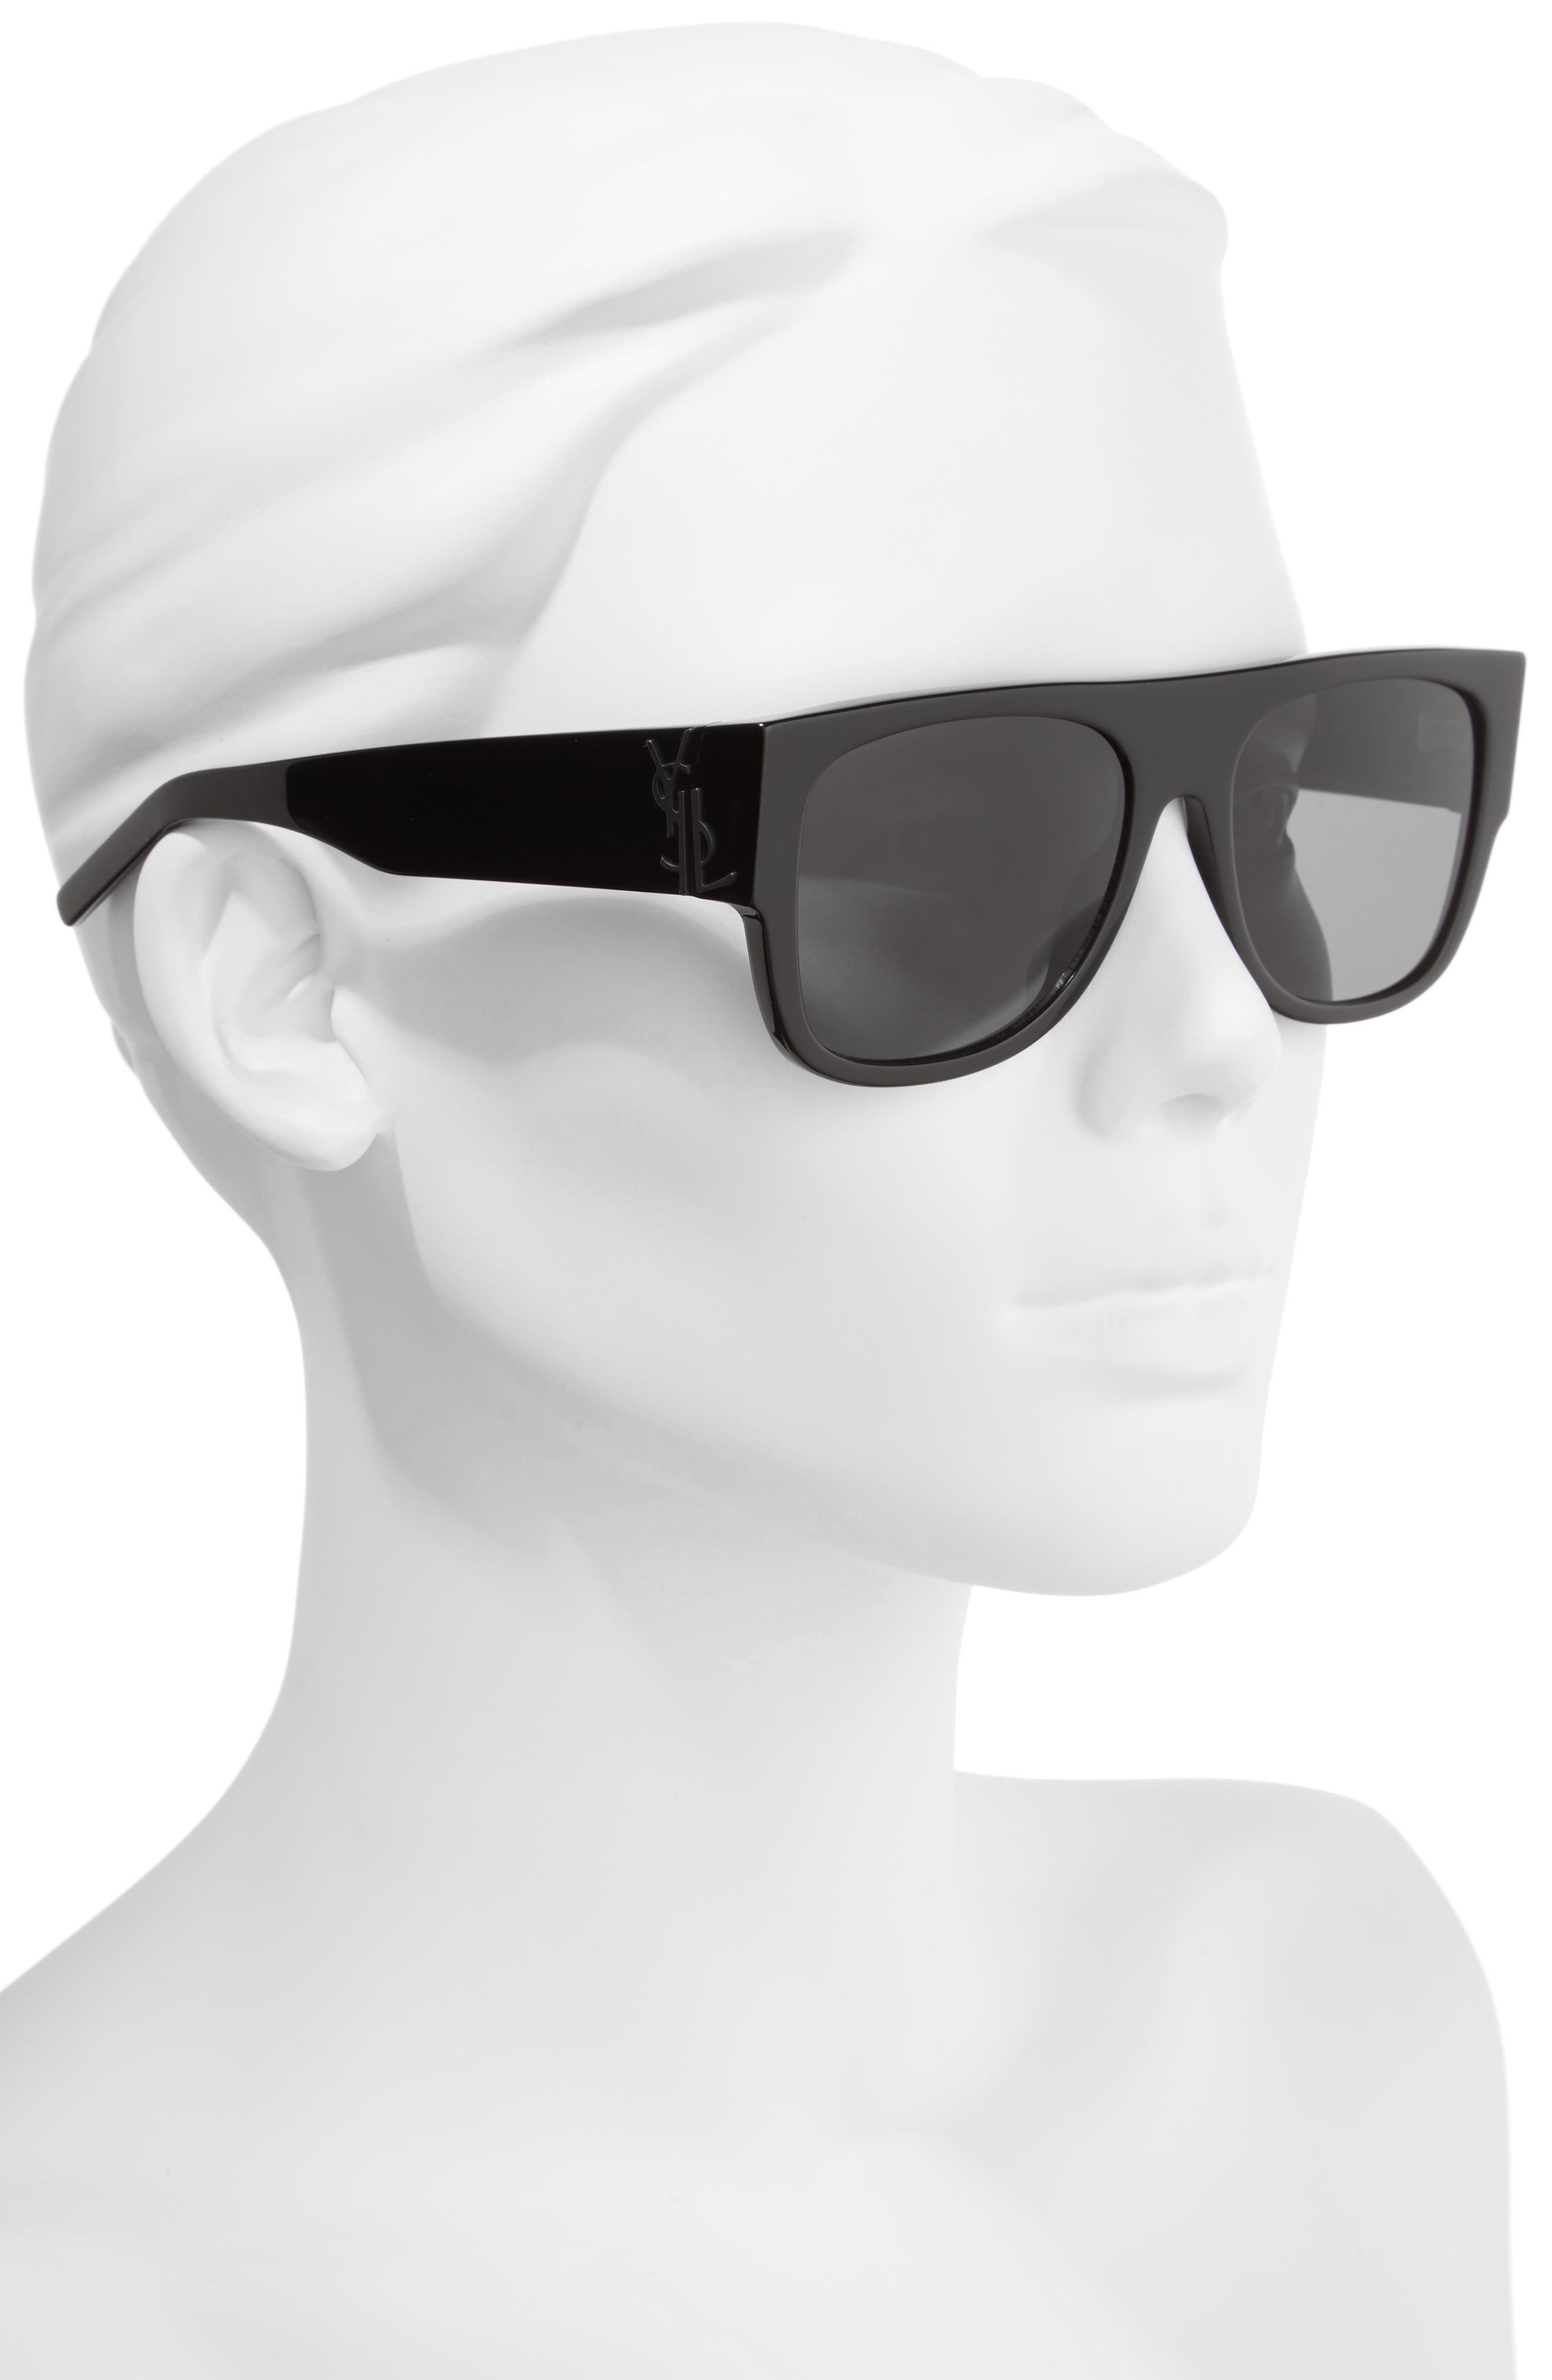 SL M16 55mm Flat Top Sunglasses,                             Alternate thumbnail 2, color,                             001